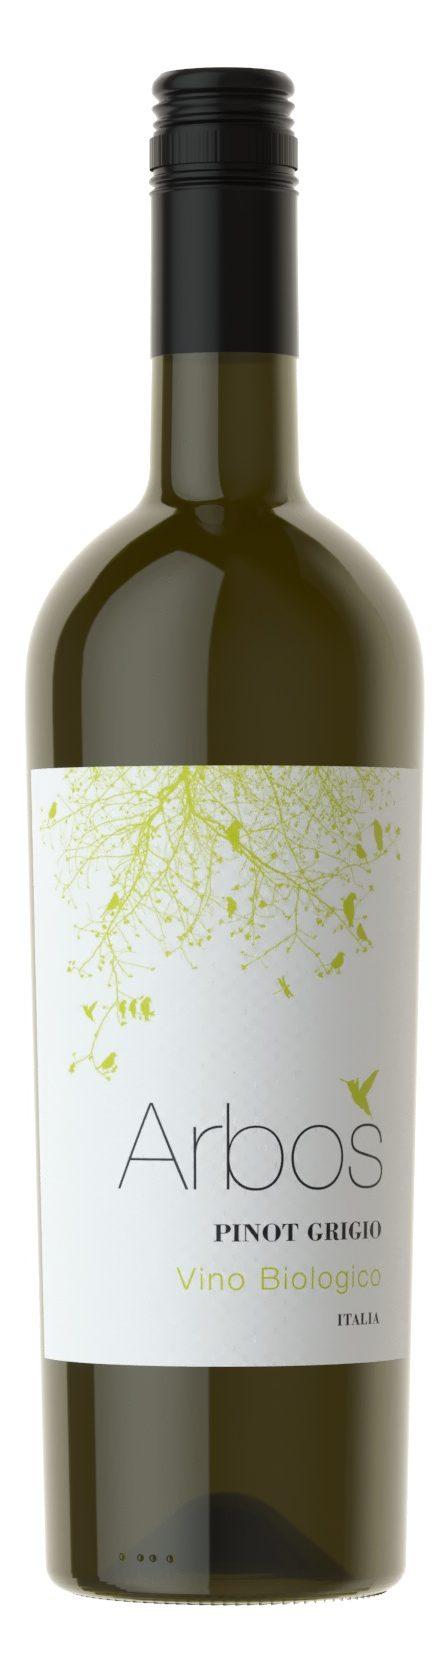 Arbos Pinot Grigio Vino Biologico   Wijnenwereld.nl